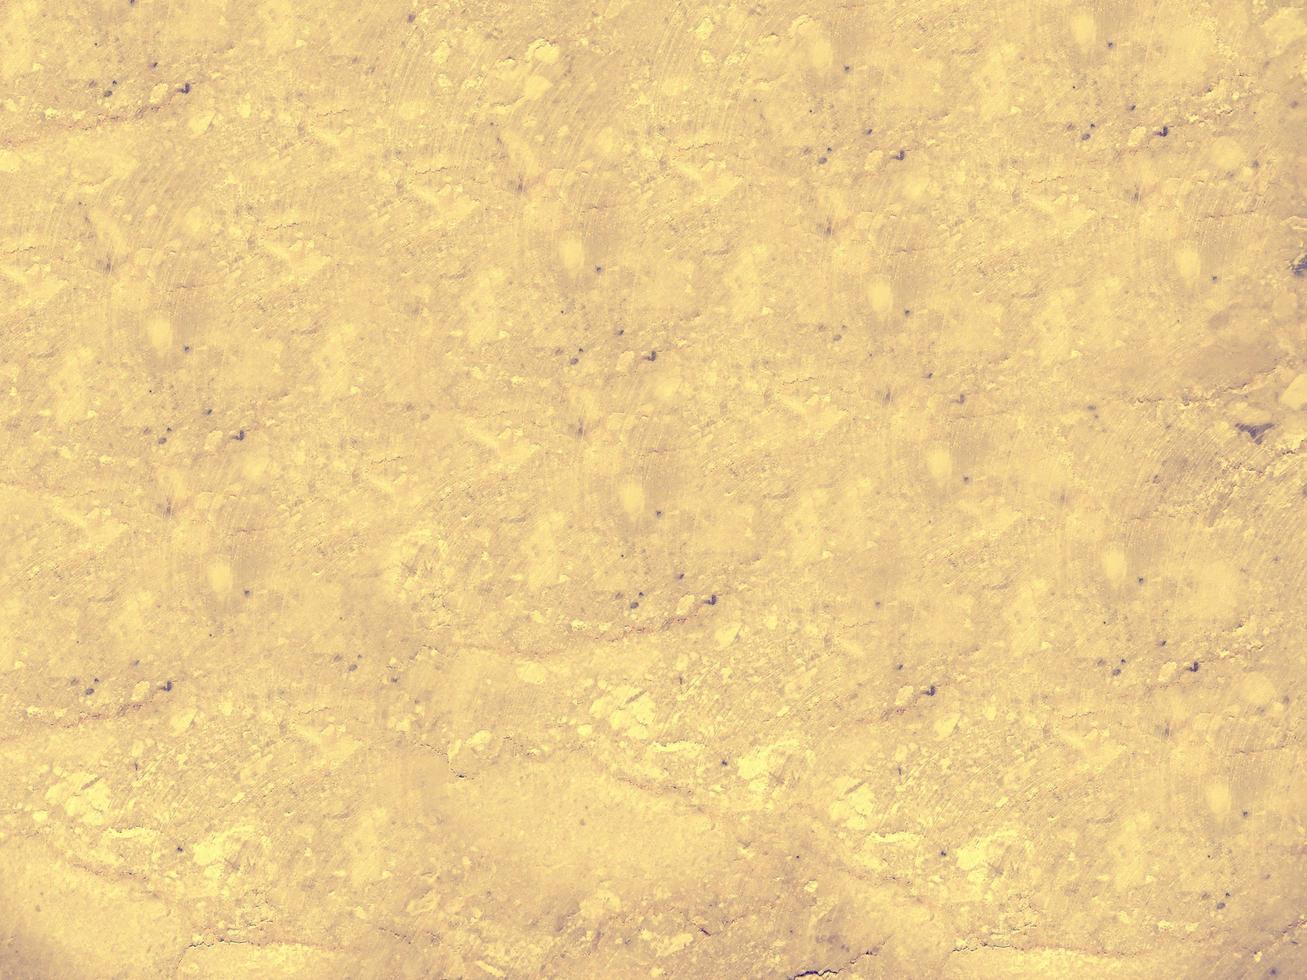 textura de mármol al aire libre foto